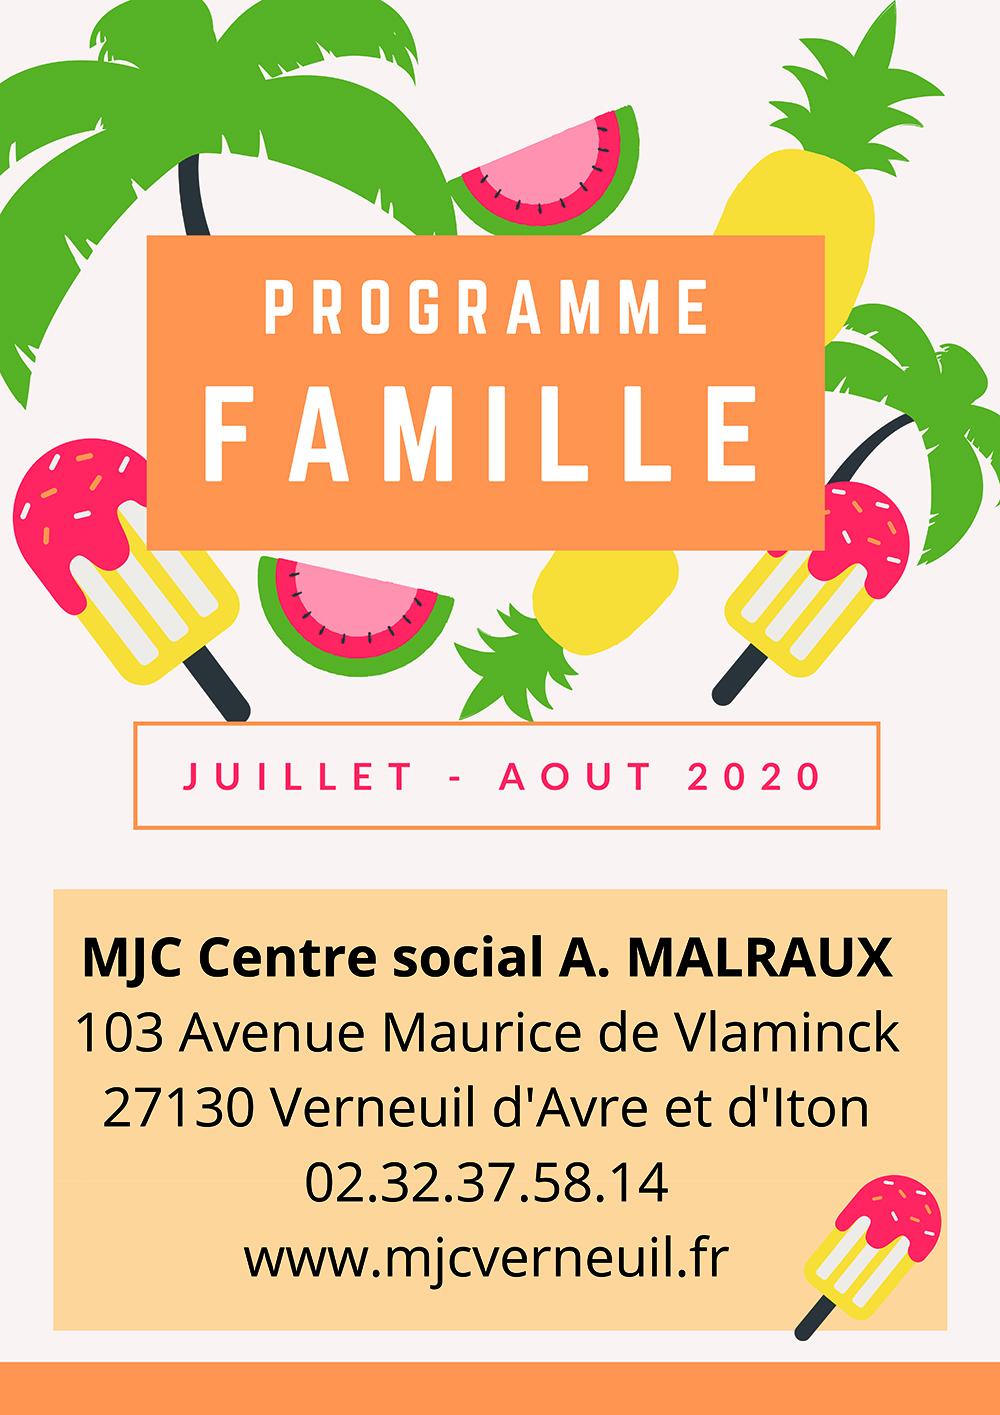 Programme Famille p1